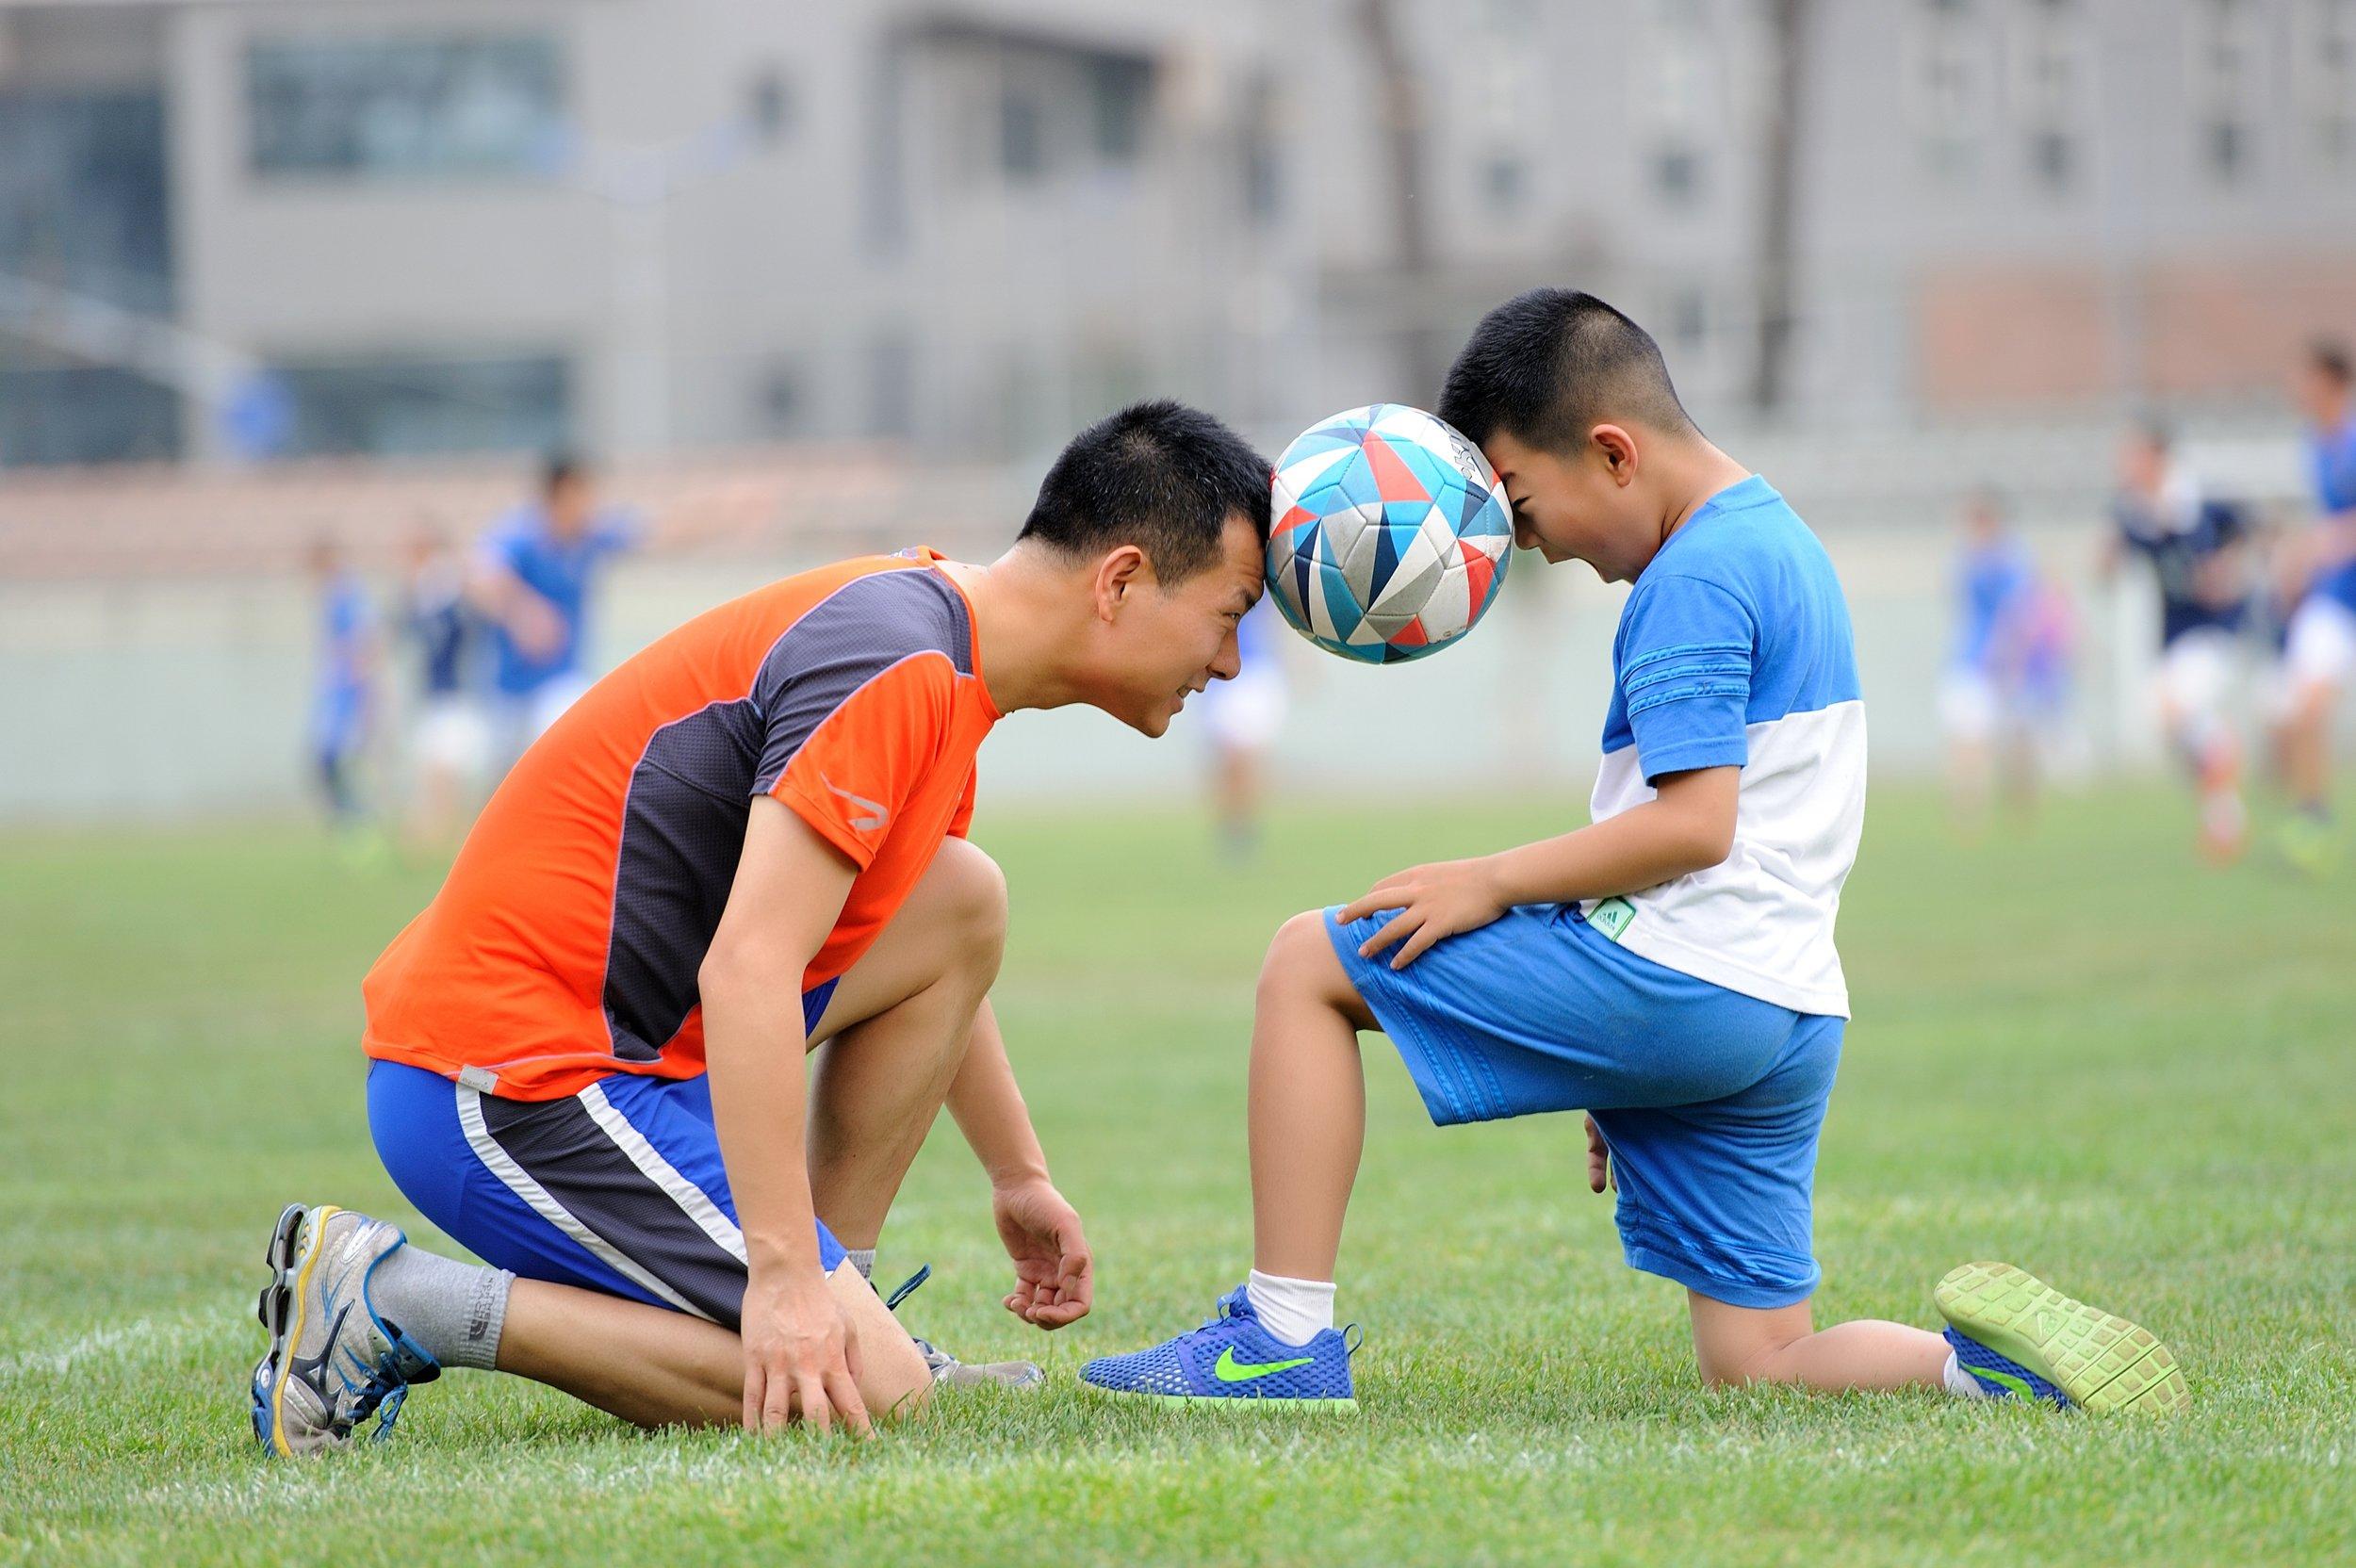 football-1533210.jpg